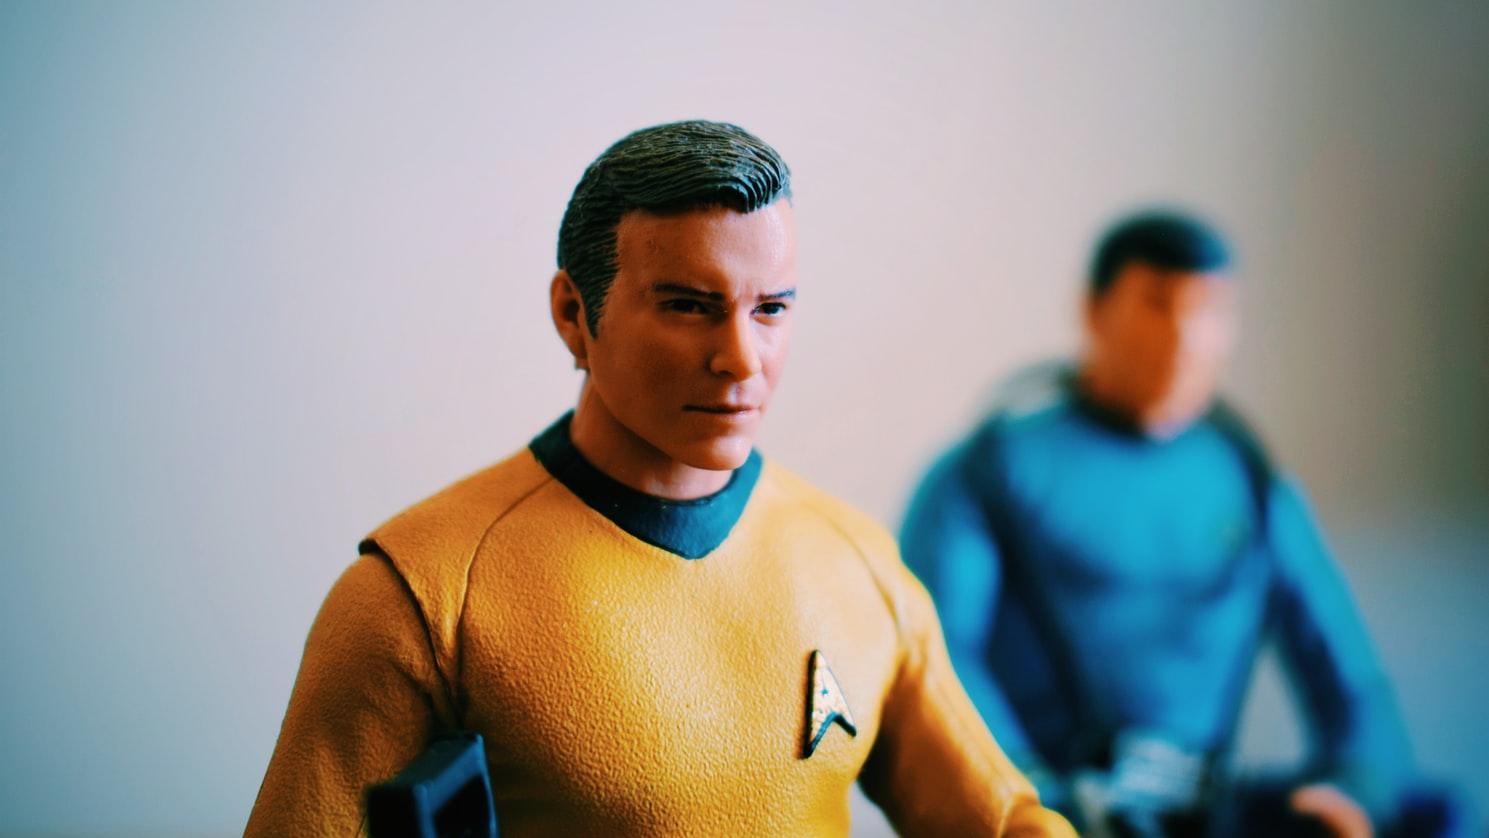 Star Trek figurines inspiring baby Vulcan names.